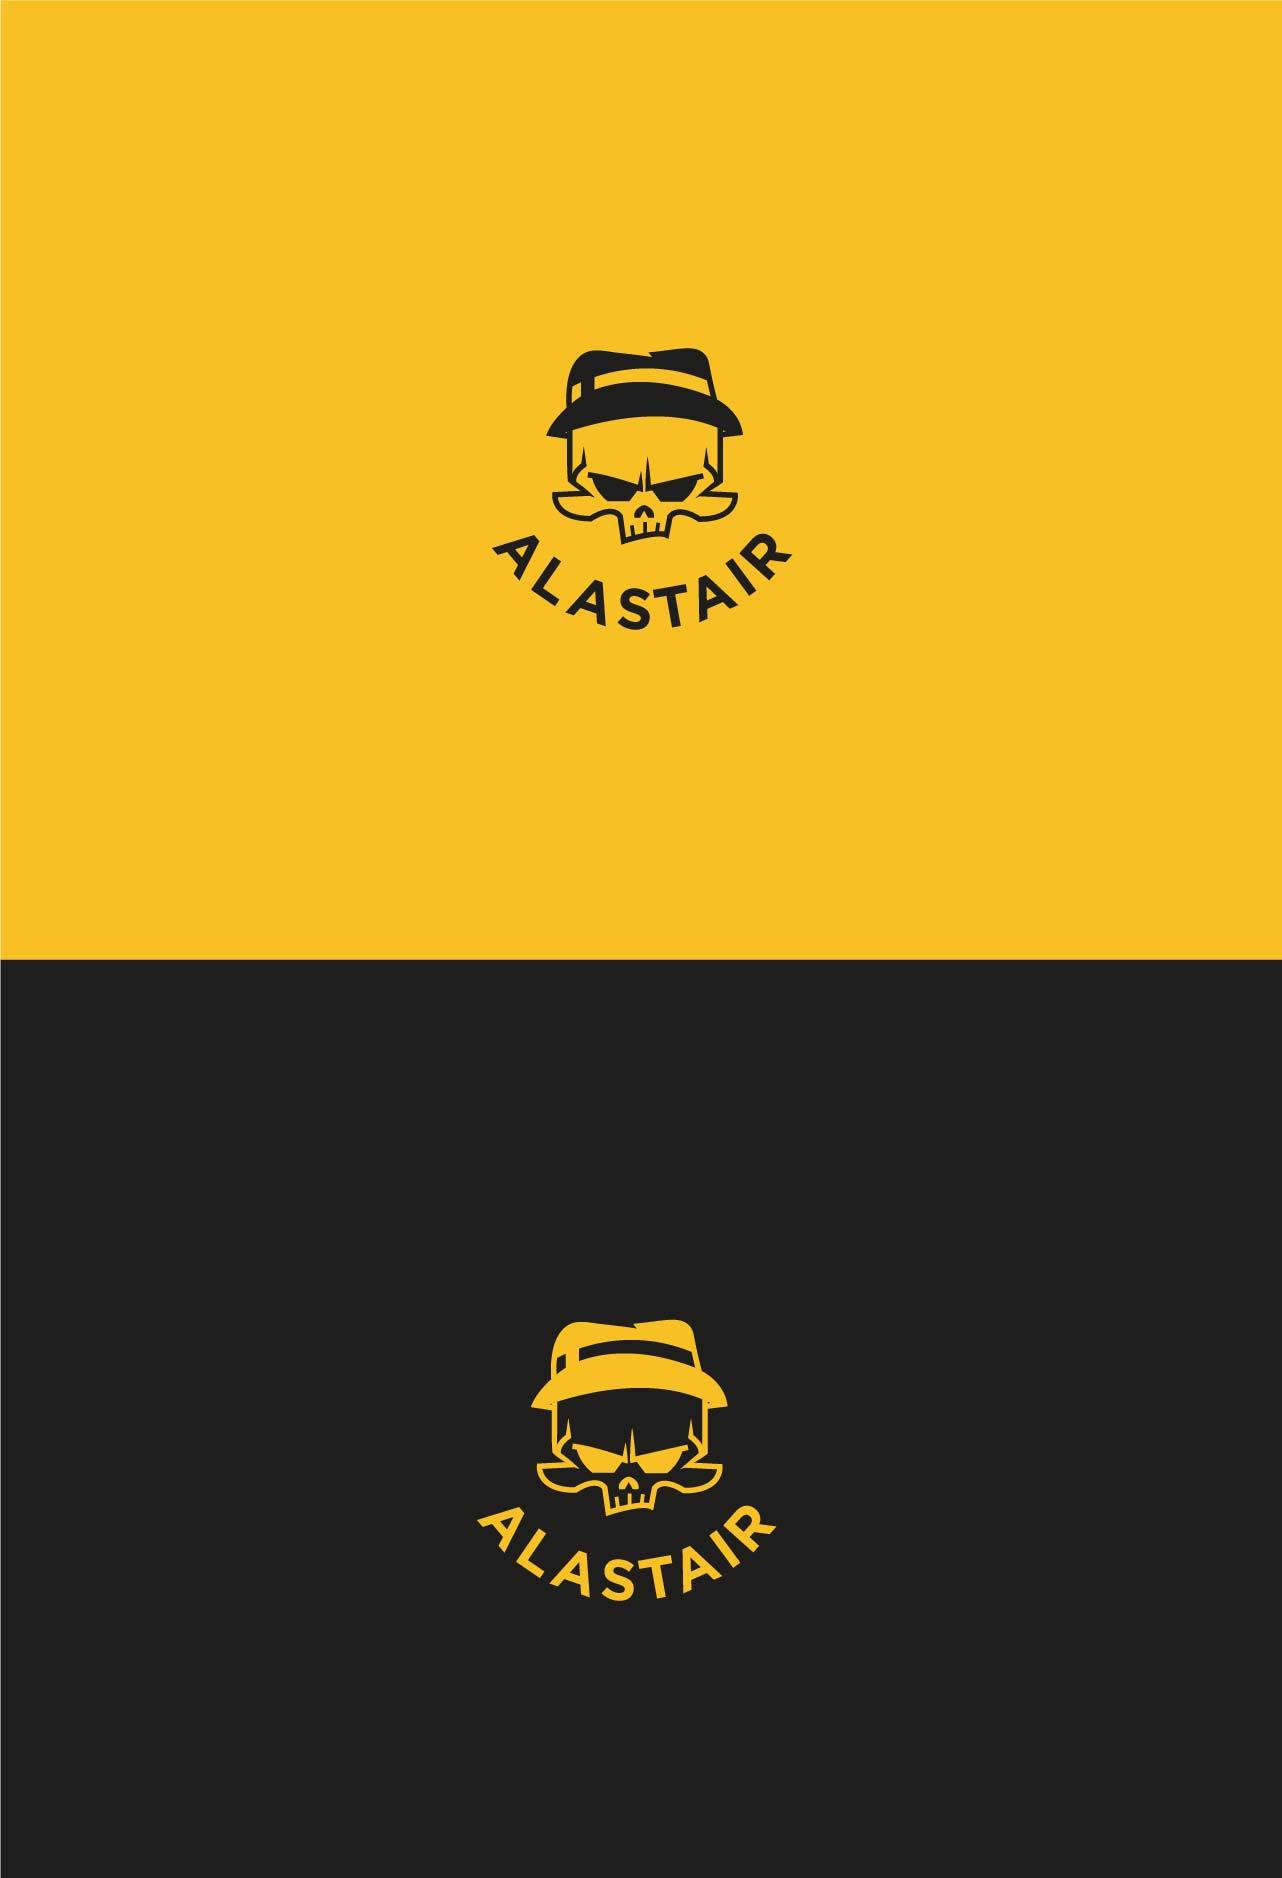 Фото Разработка дизайна логотипа для интернет-магазина рок-атрибутики «Alastair» Вариант 7